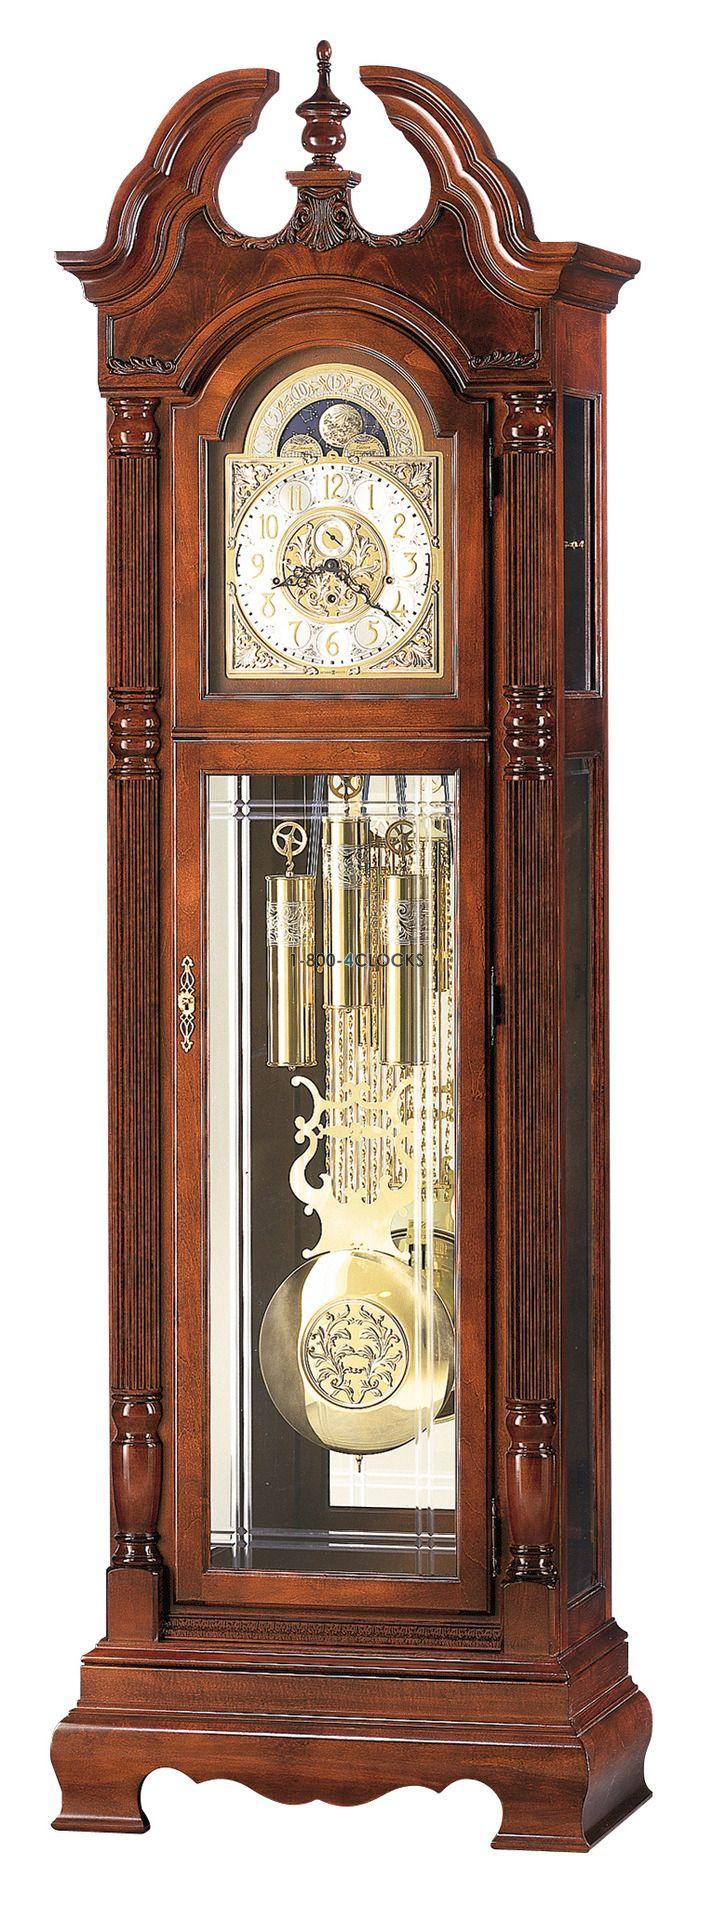 Grandfather-Clock-Howard-Miller-Glenmour-610-904-610904